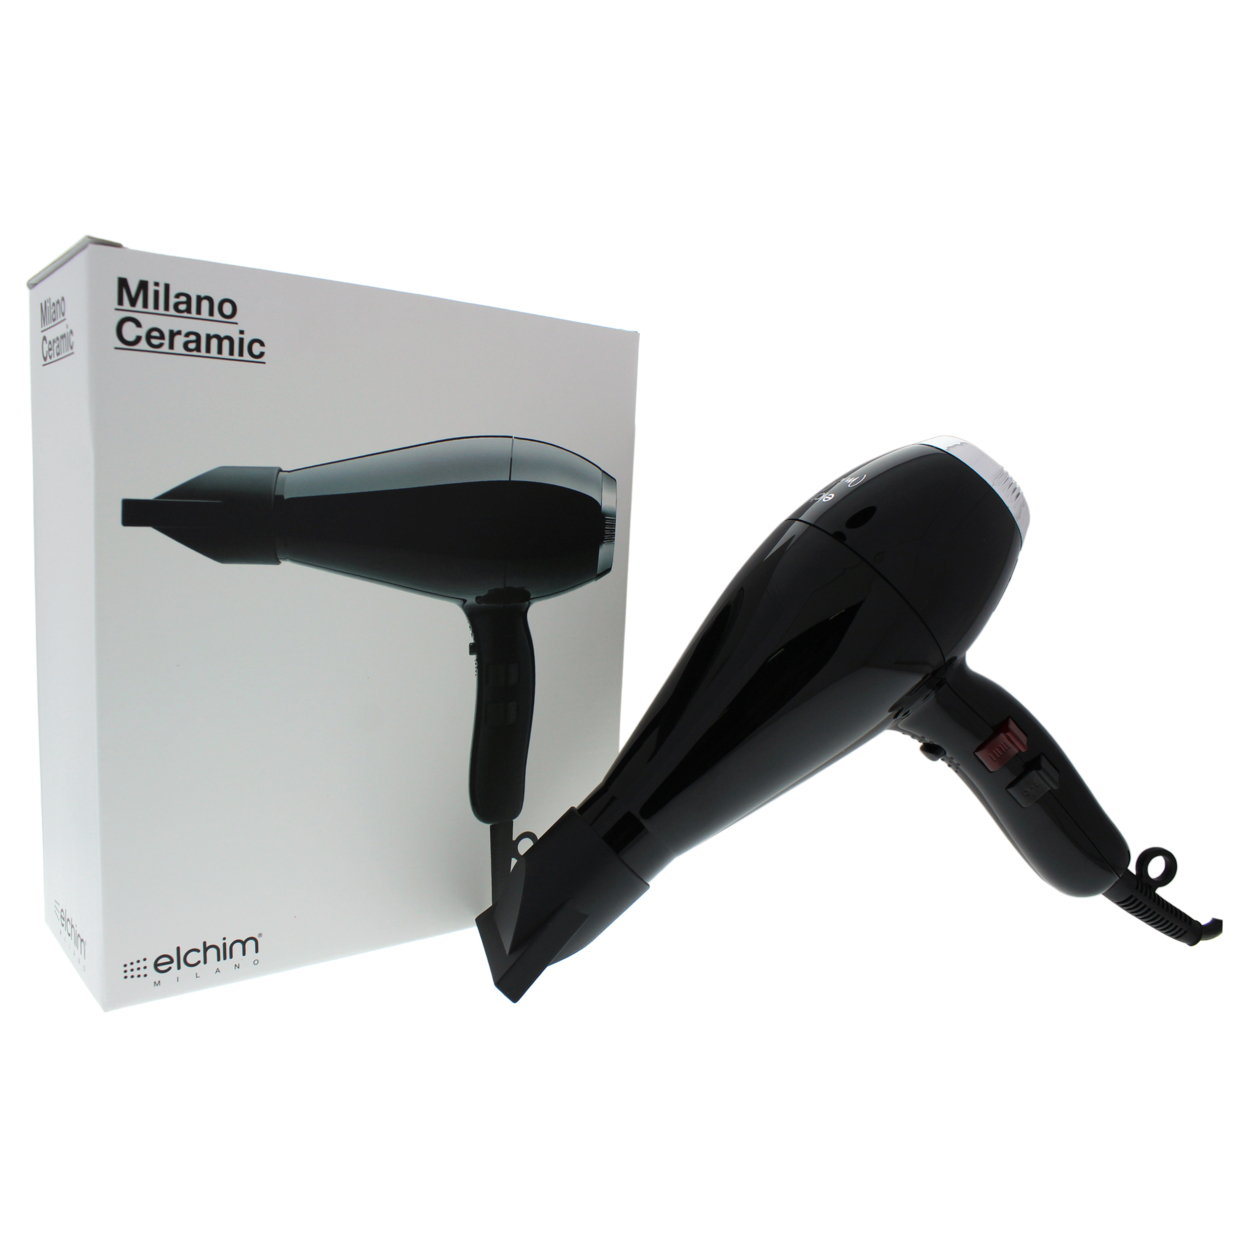 Milano Ceramic Hair Dryer - Black/Silver by Elchim for Unisex - 1 Pc Hair Dryer 598dcf9b2a00e418967fdb4a